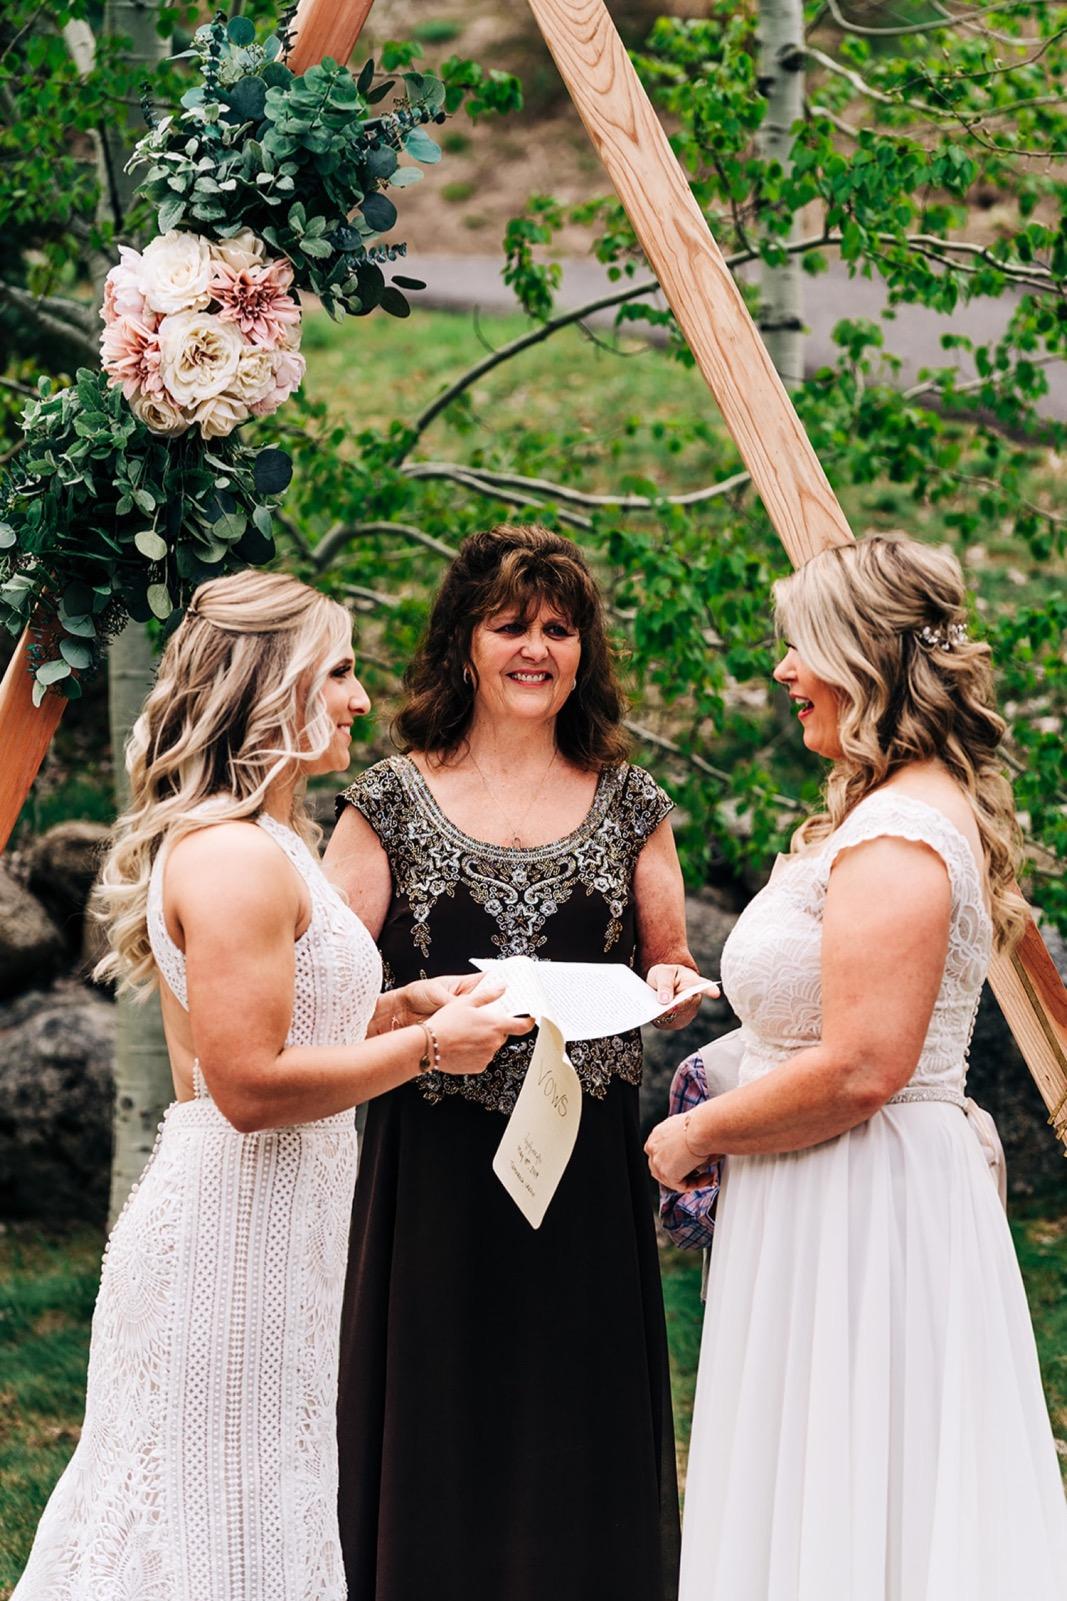 076_falissa_heather_wedding-190.jpg